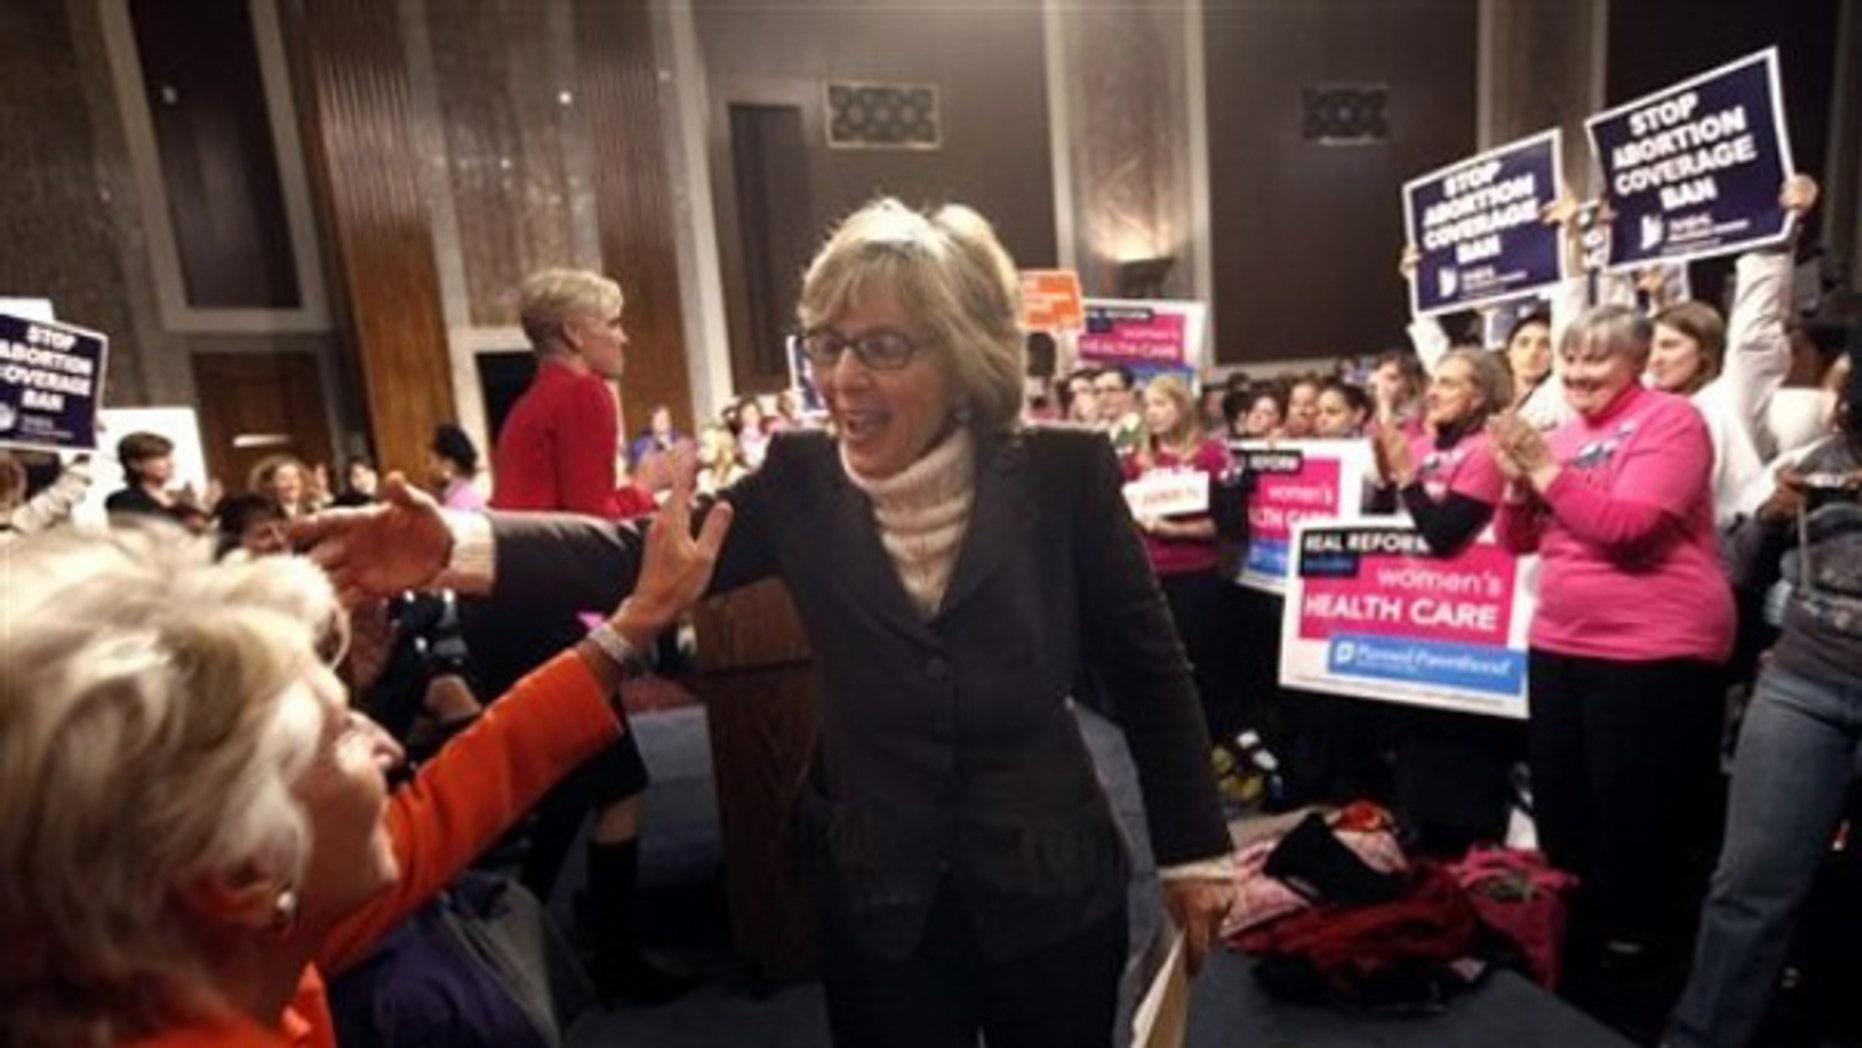 Sen. Barbara Boxer, D-Calif., greets participants at an abortion-rights rally Dec. 2 in Washington. (AP Photo)